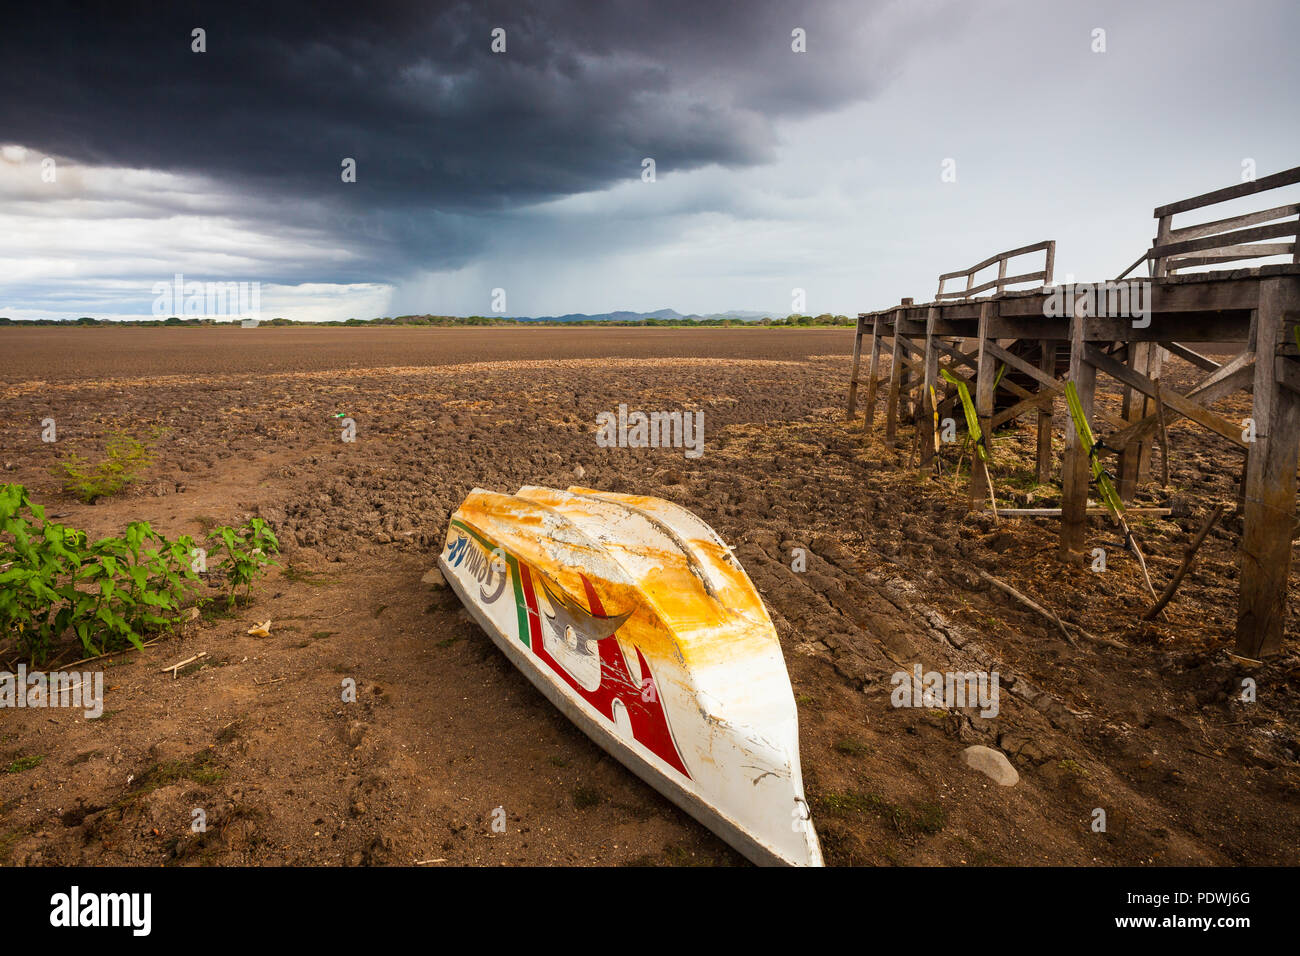 Drought in the protected wetland Cienaga de las Macanas in the Herrera province, Republic of Panama. Stock Photo